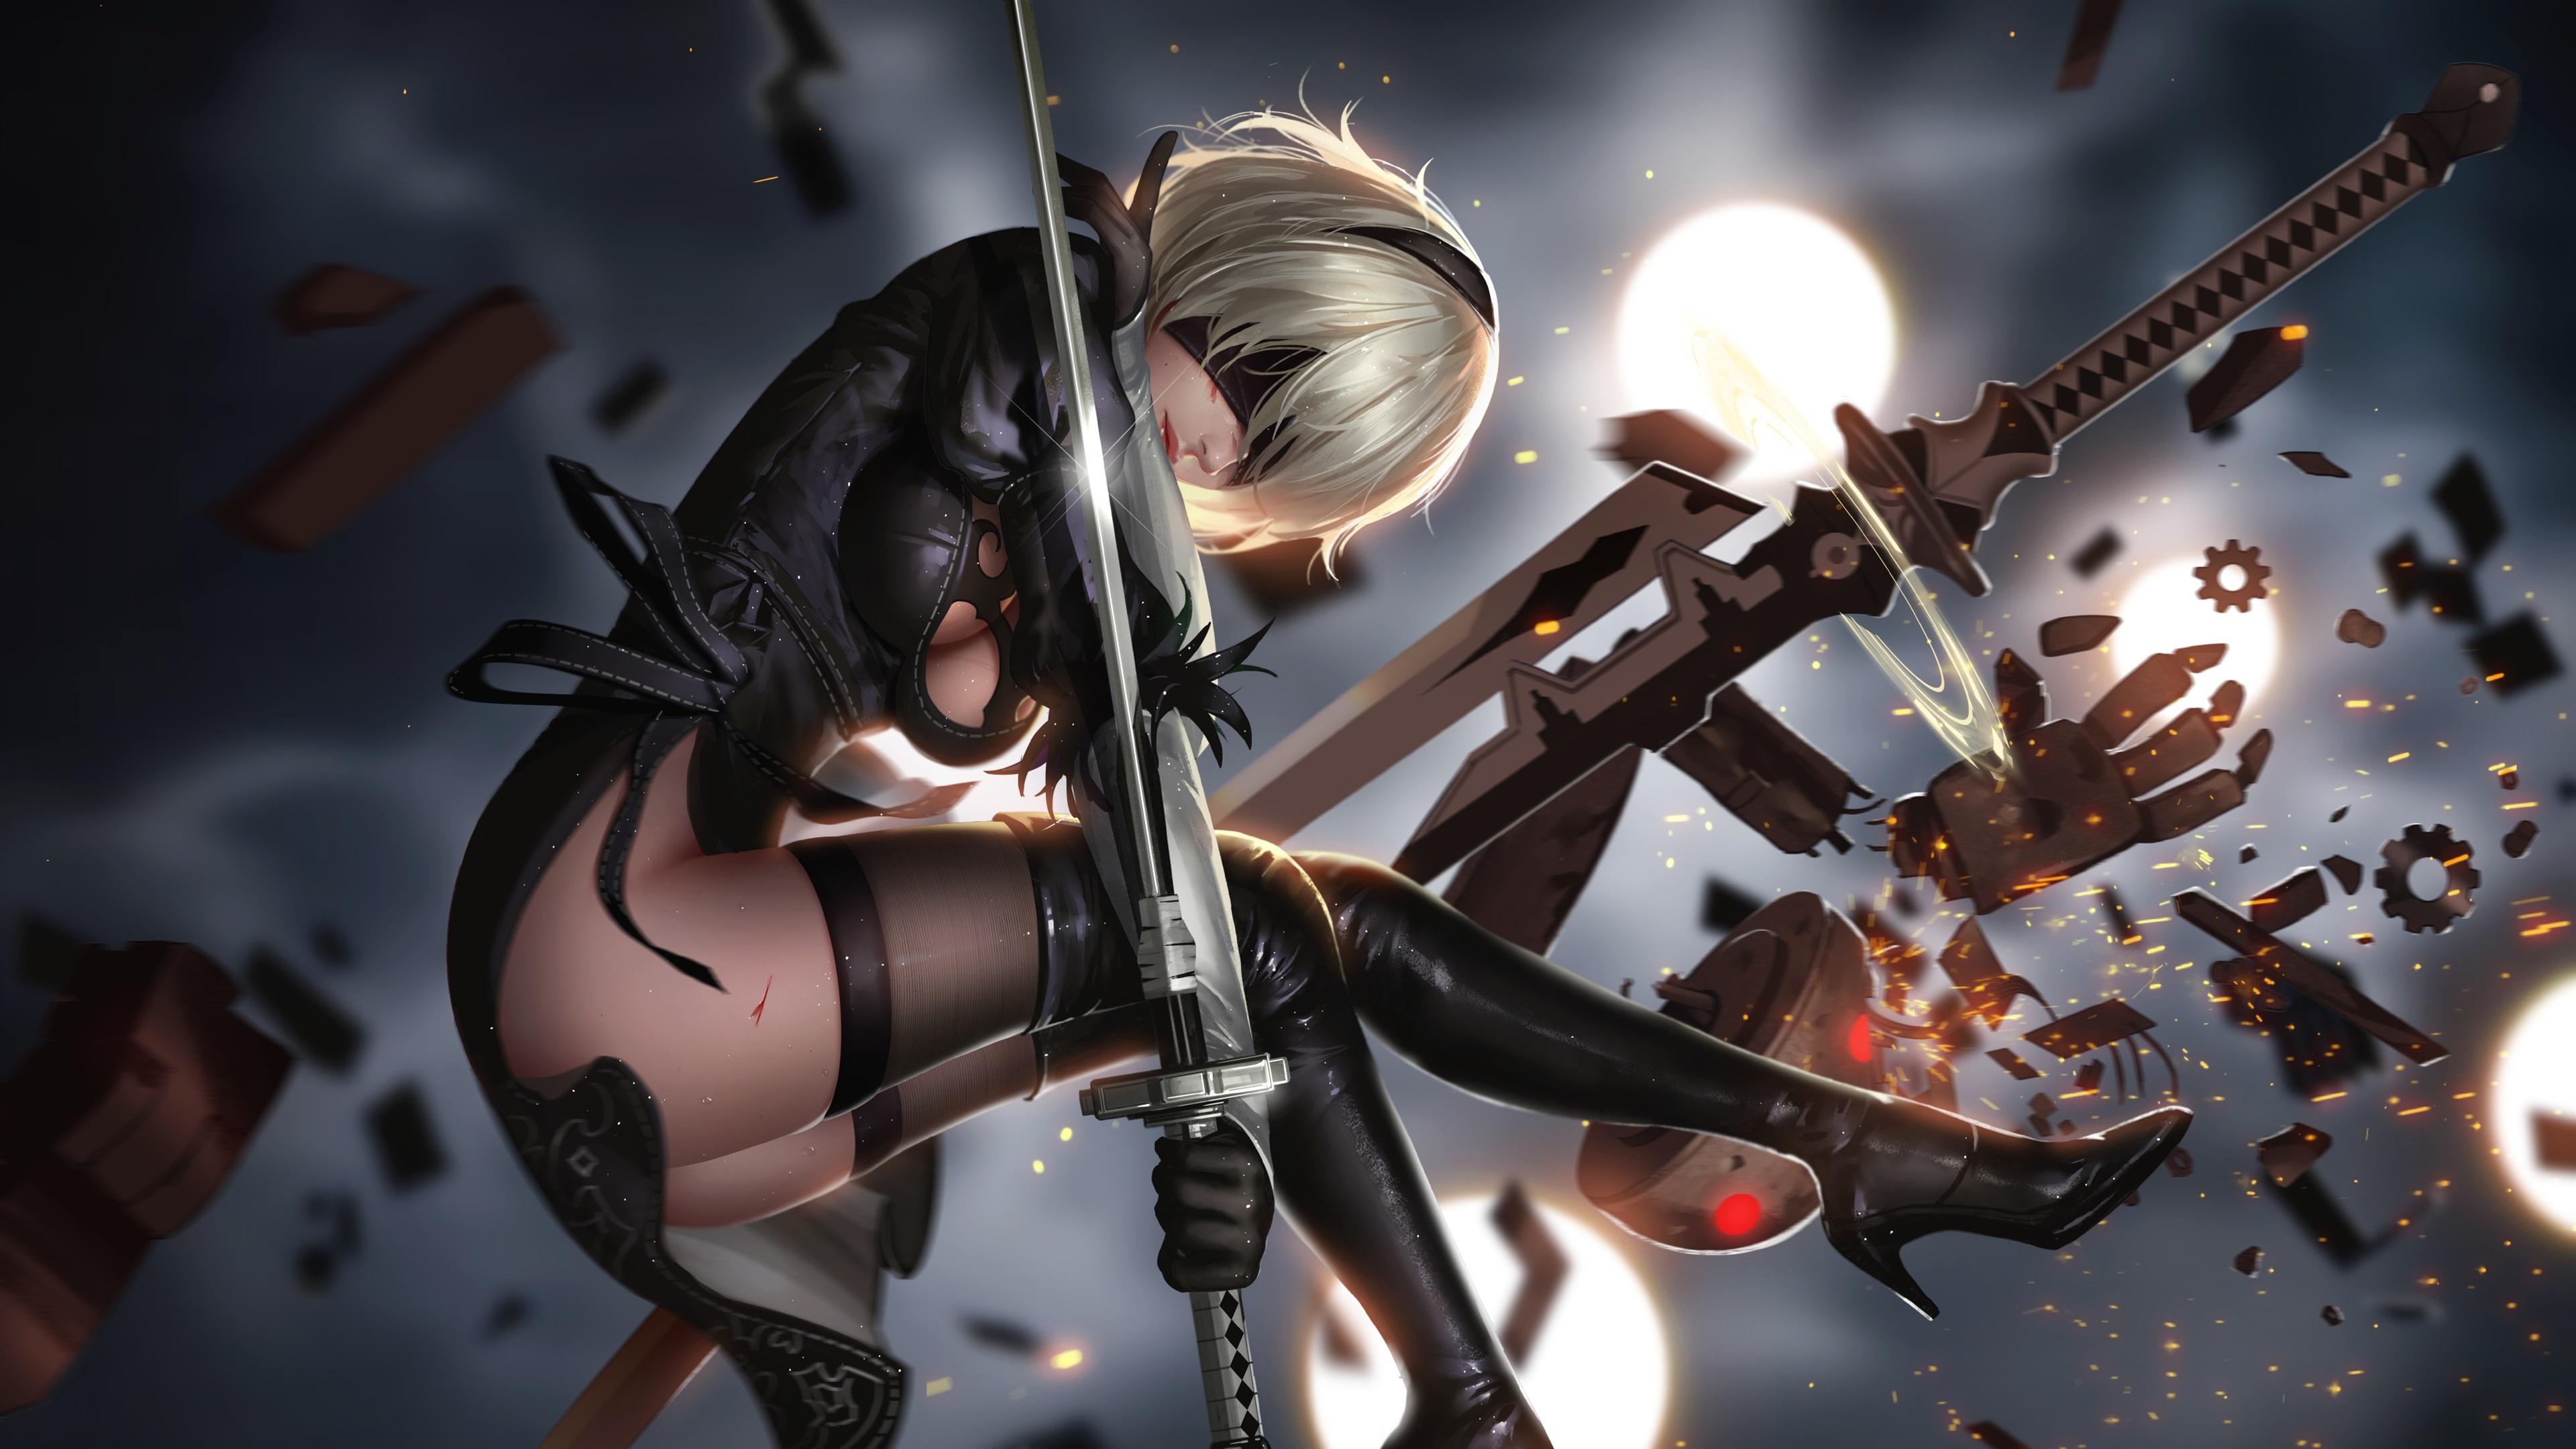 2b Nier Automata Katana Hd 4k Wallpaper: Wallpaper Nier: Automata, Girl, Sword, Fight 3840x2160 UHD